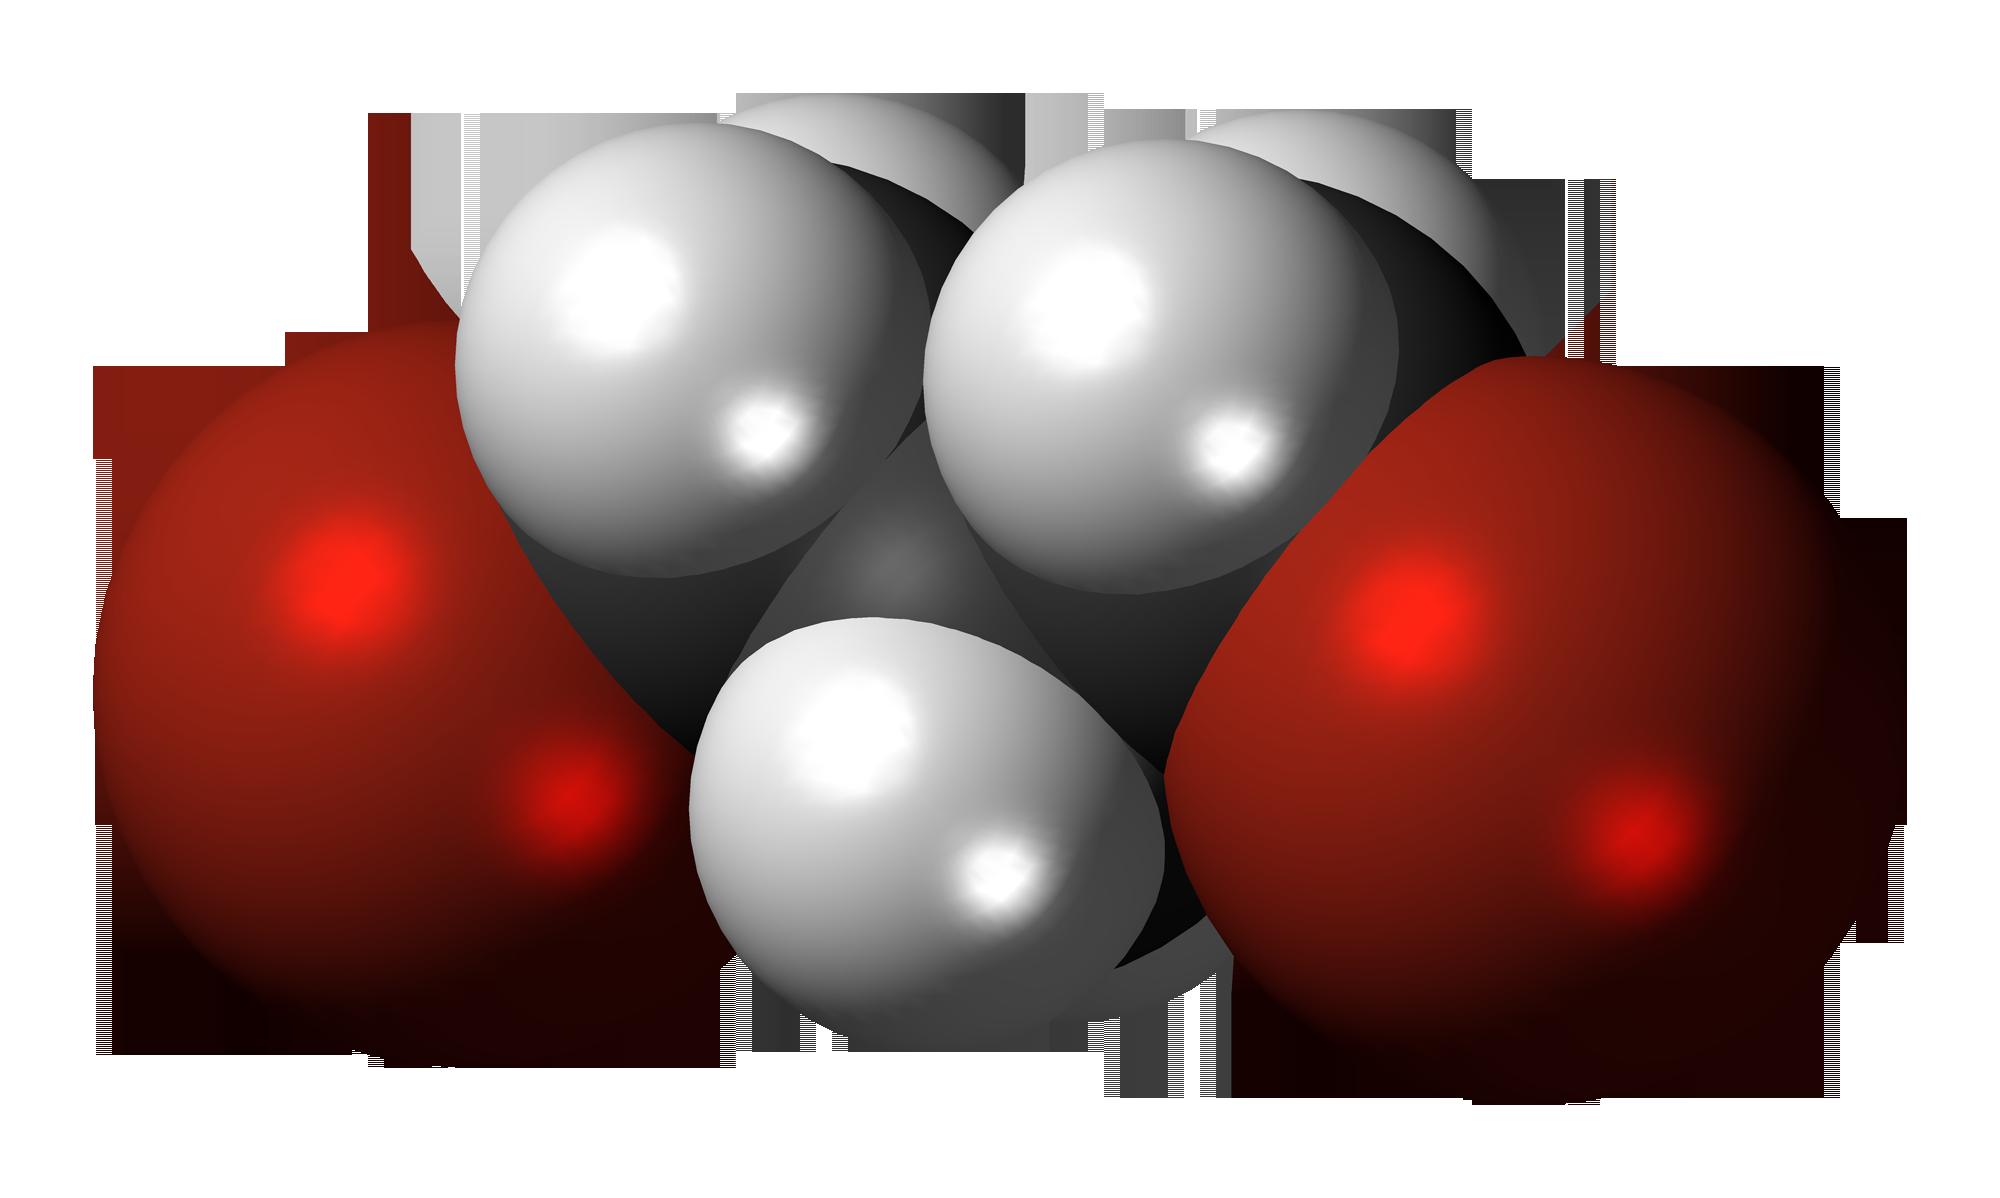 1,3-Dibromopropane